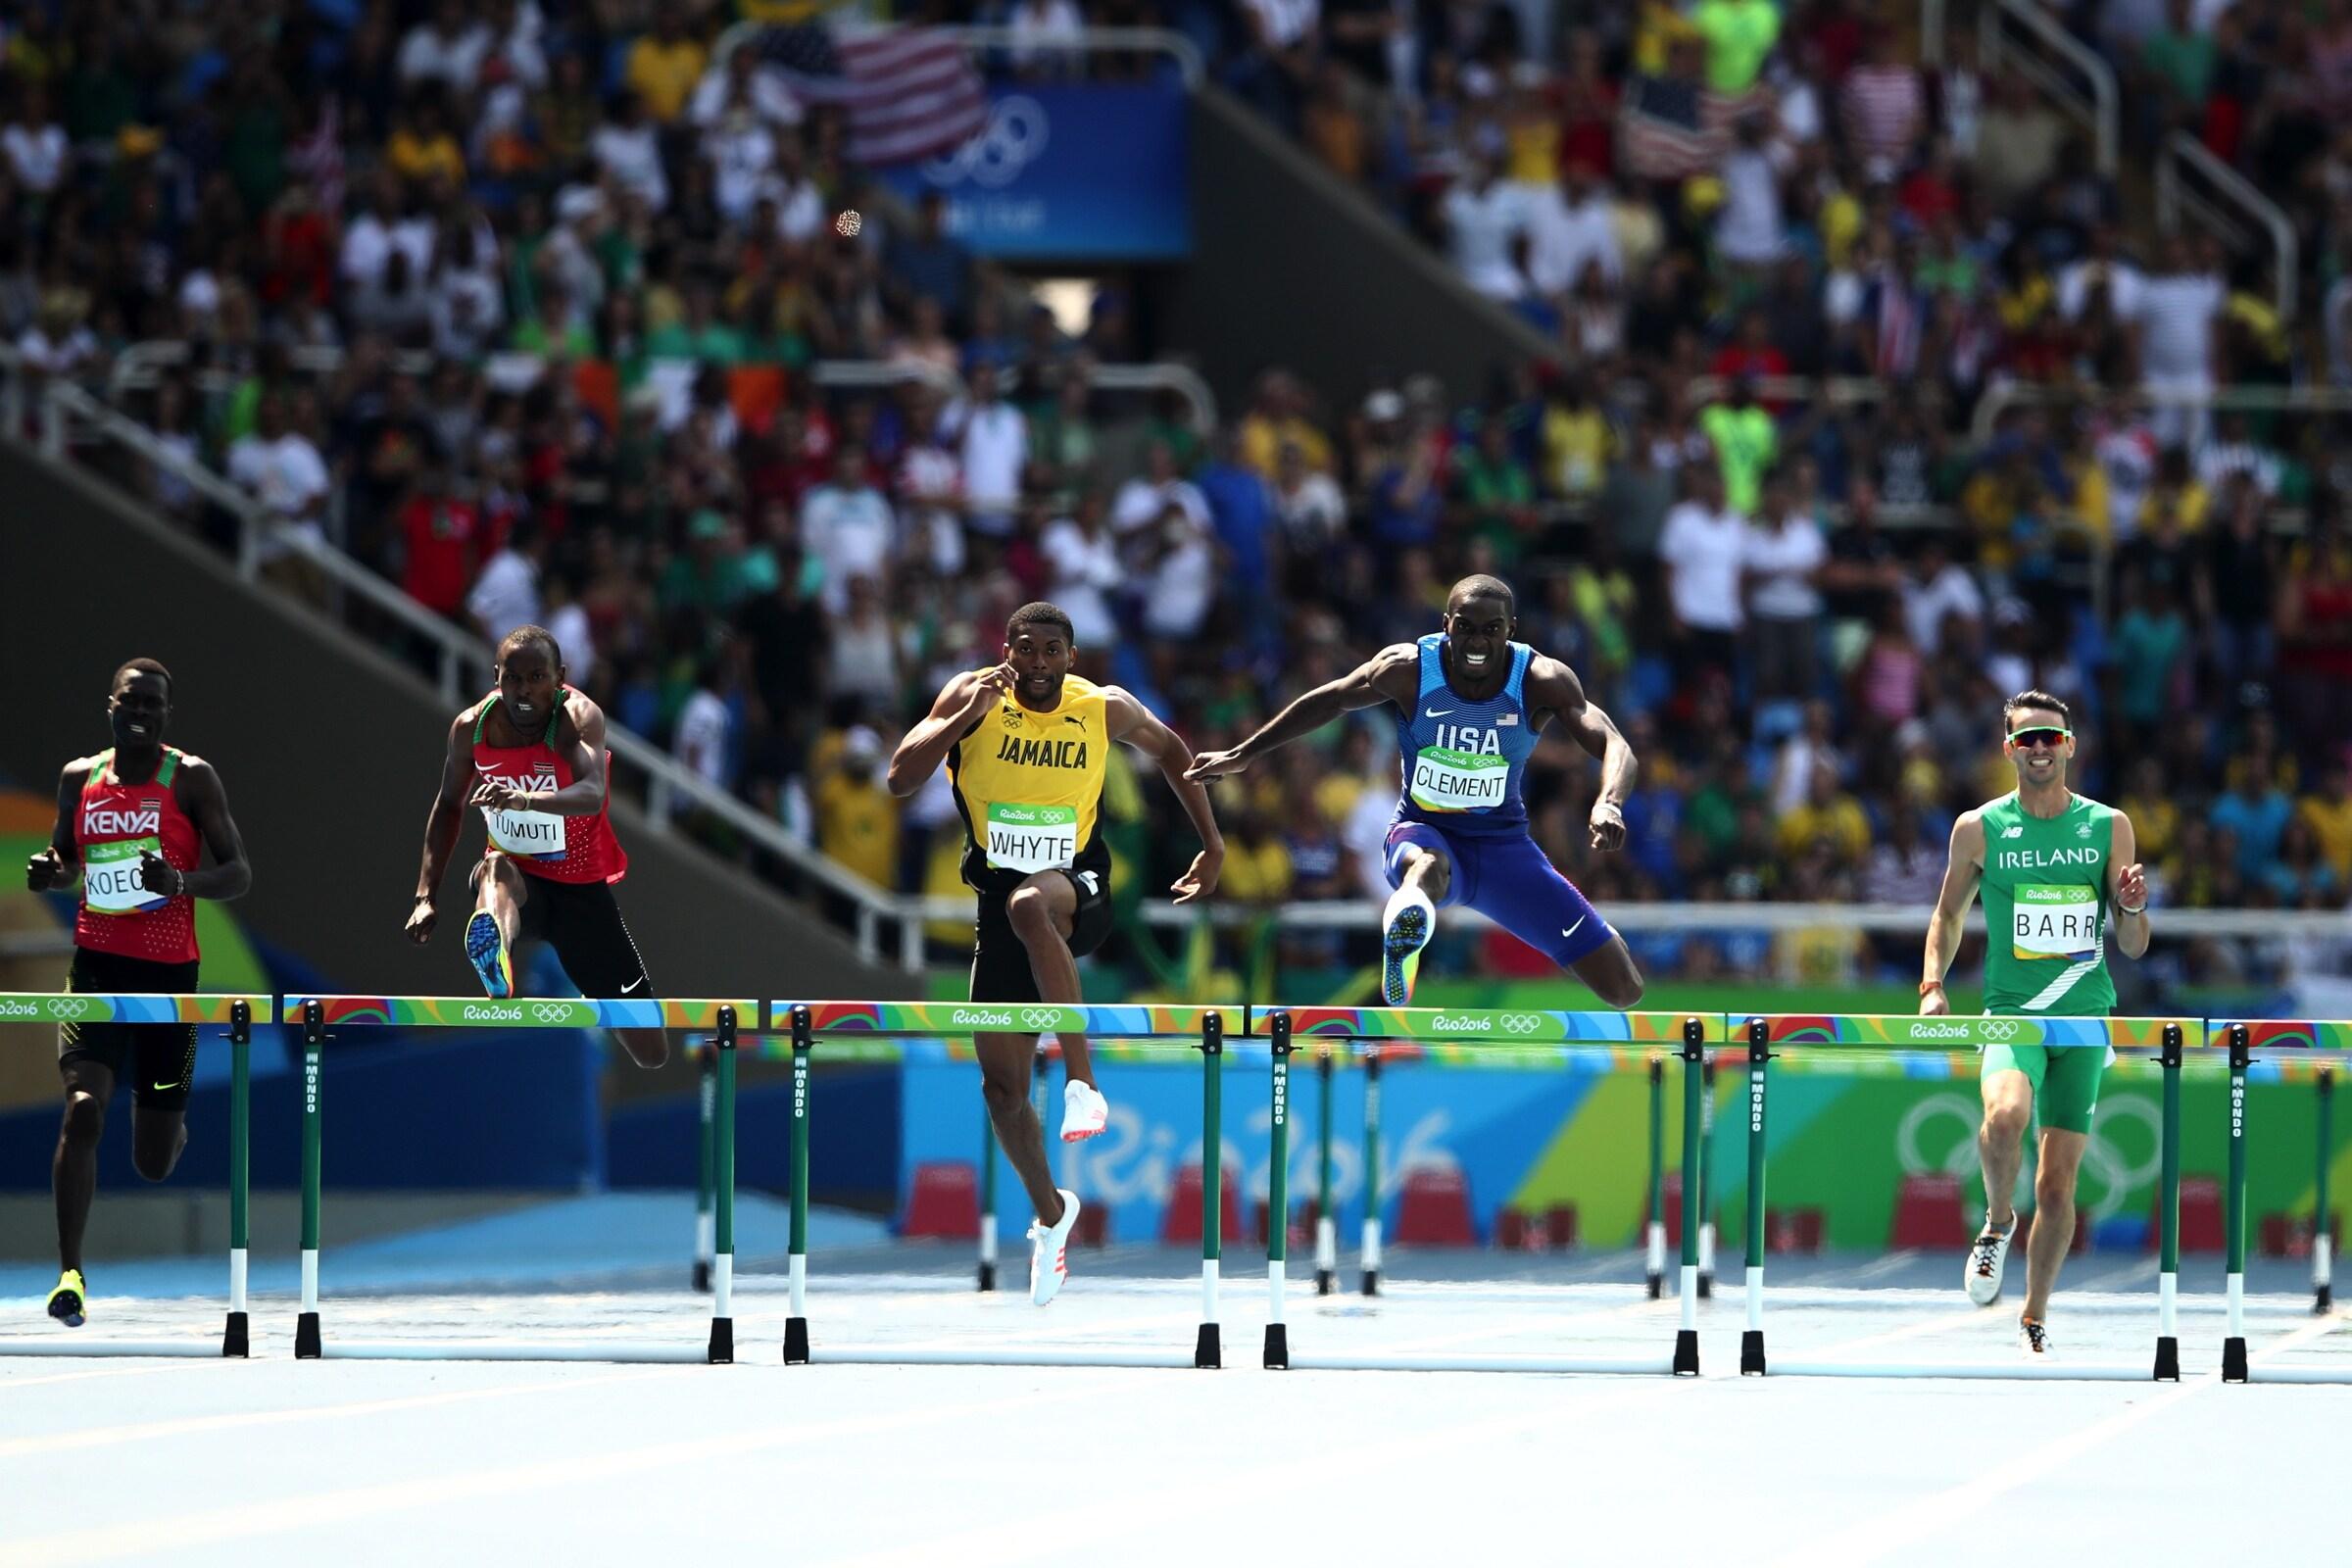 Athletics - 400m Hurdles Men